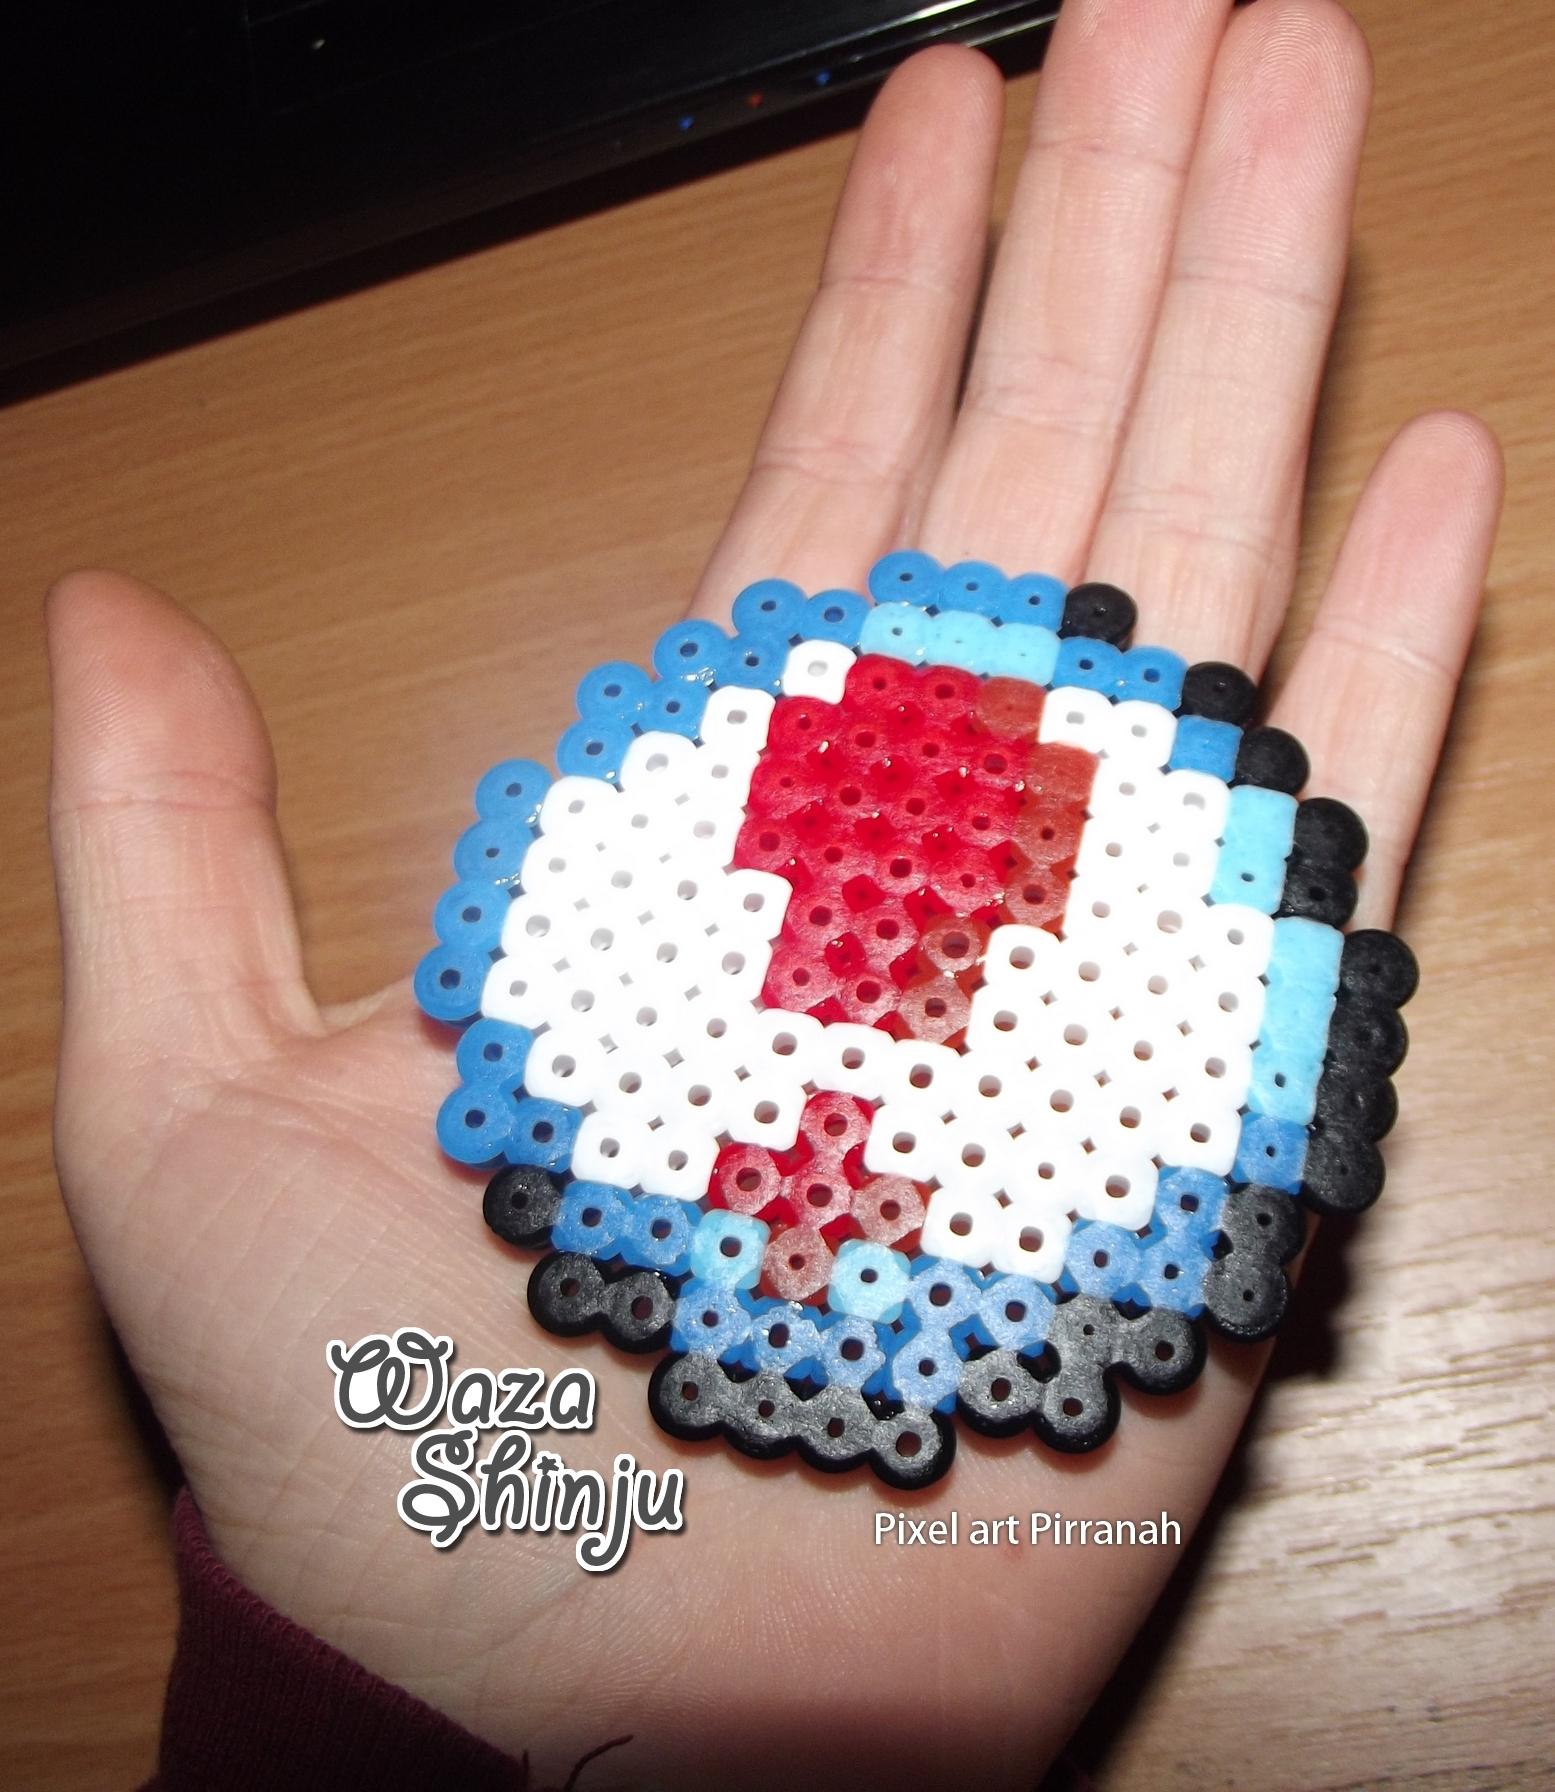 Animal Crossing Trap Pixel Art Waza Shinju Online Store